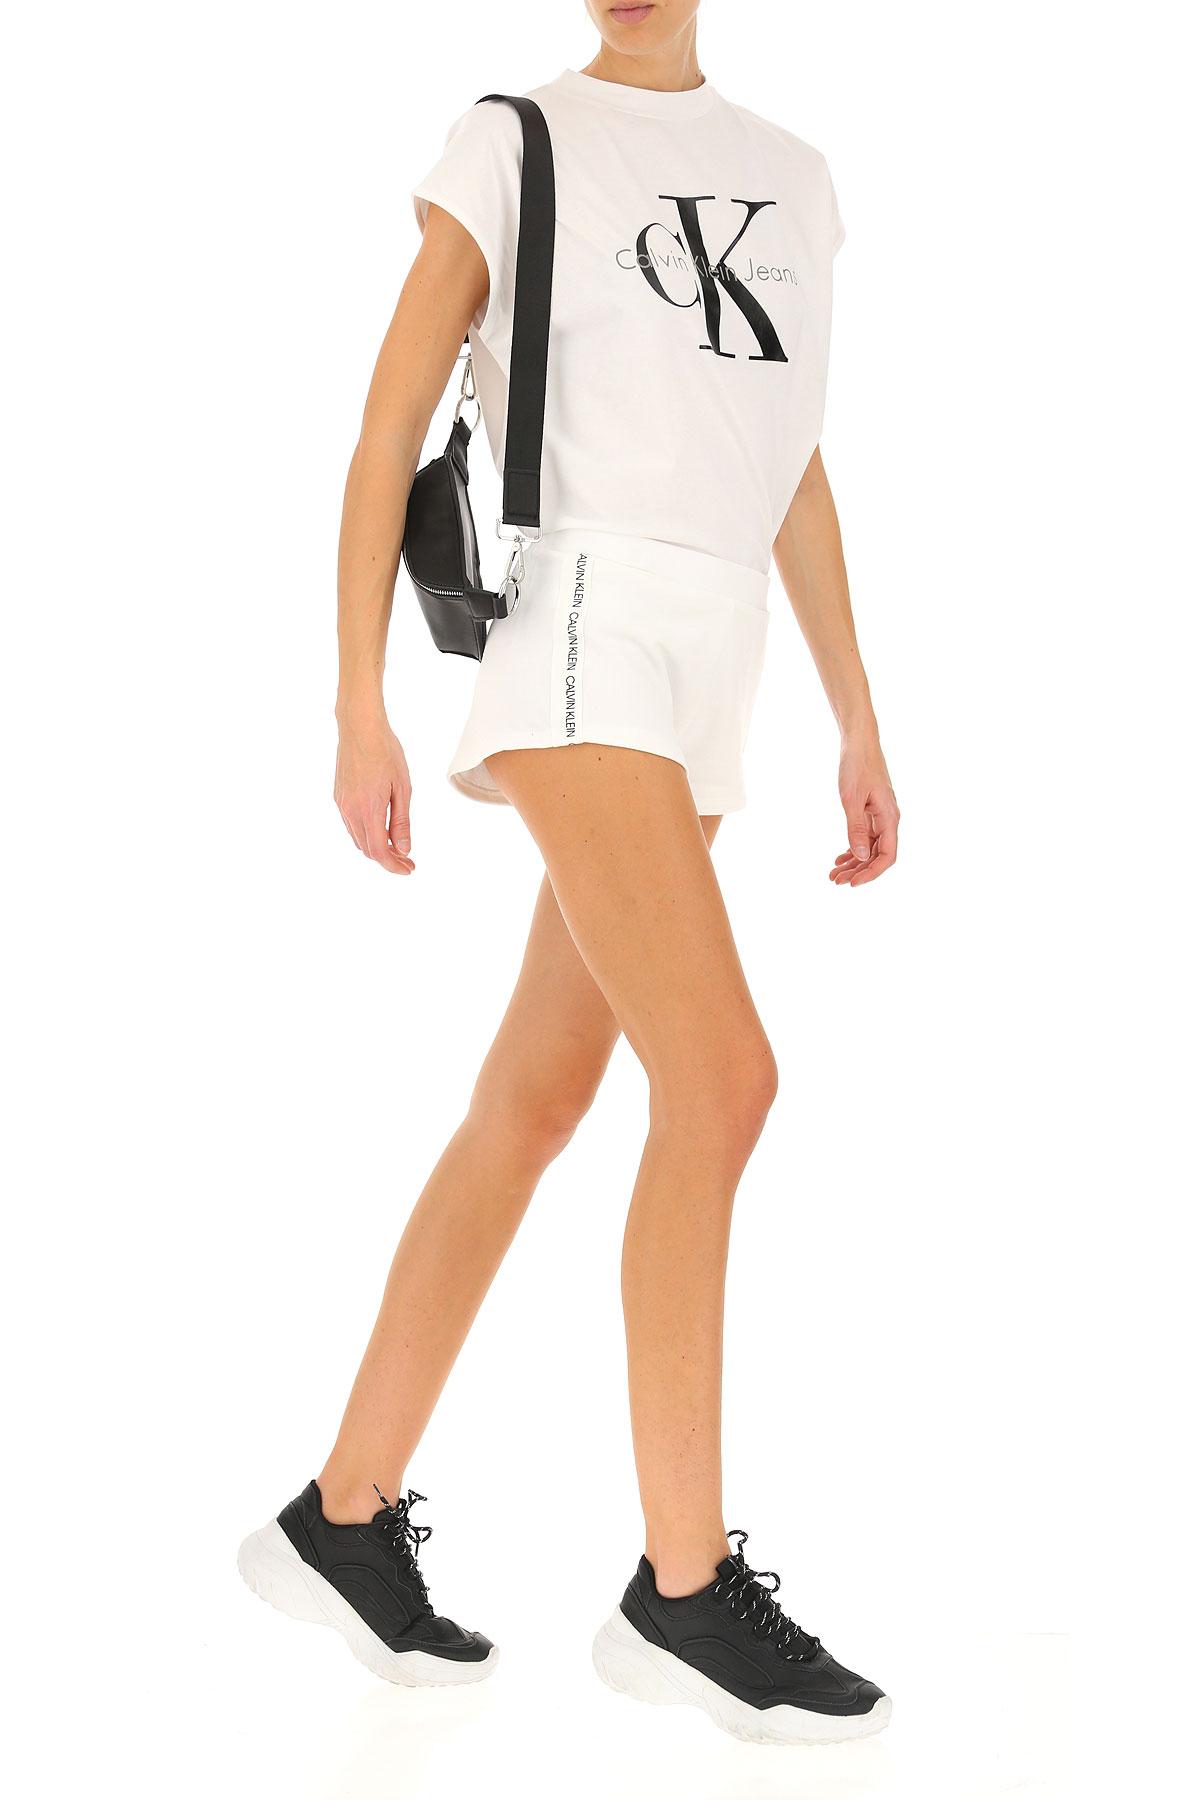 Blanco Mujer 2019 Klein Para Primavera nbsp; Calvin Ropa verano ZB0tTq